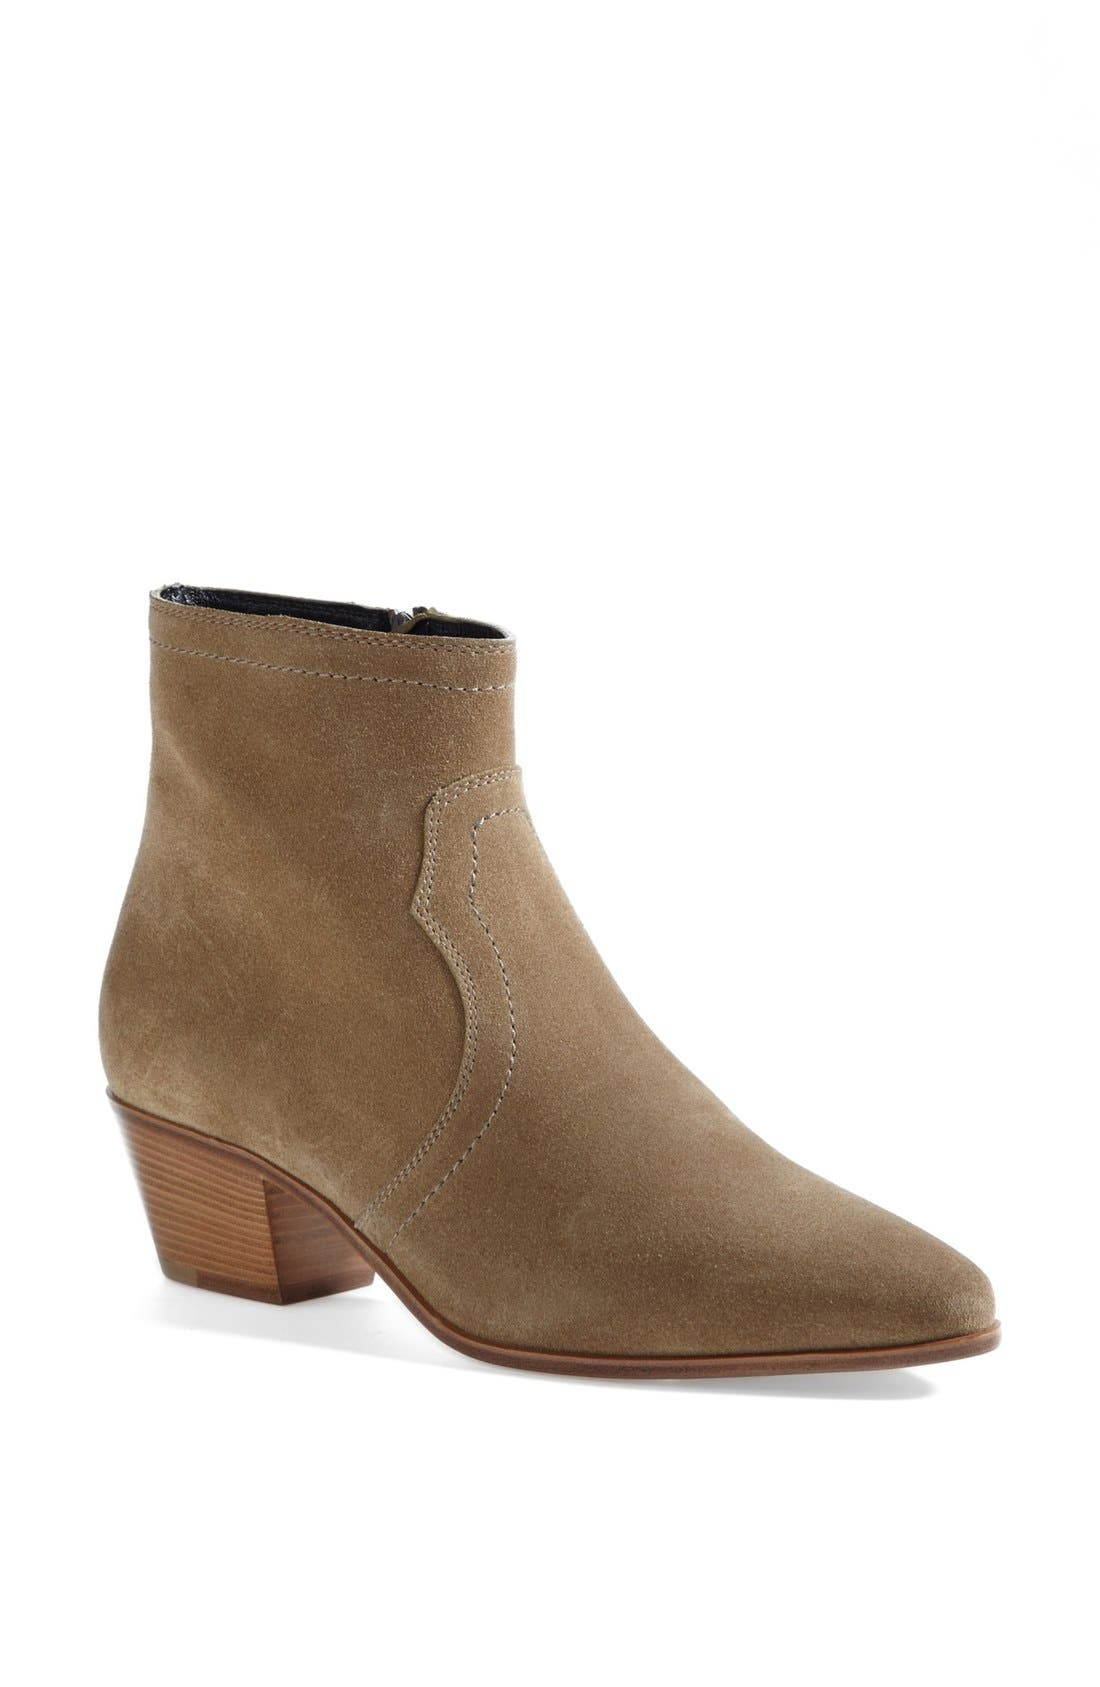 Alternate Image 1 Selected - Saint Laurent 'Rock' Calfskin Leather Boot